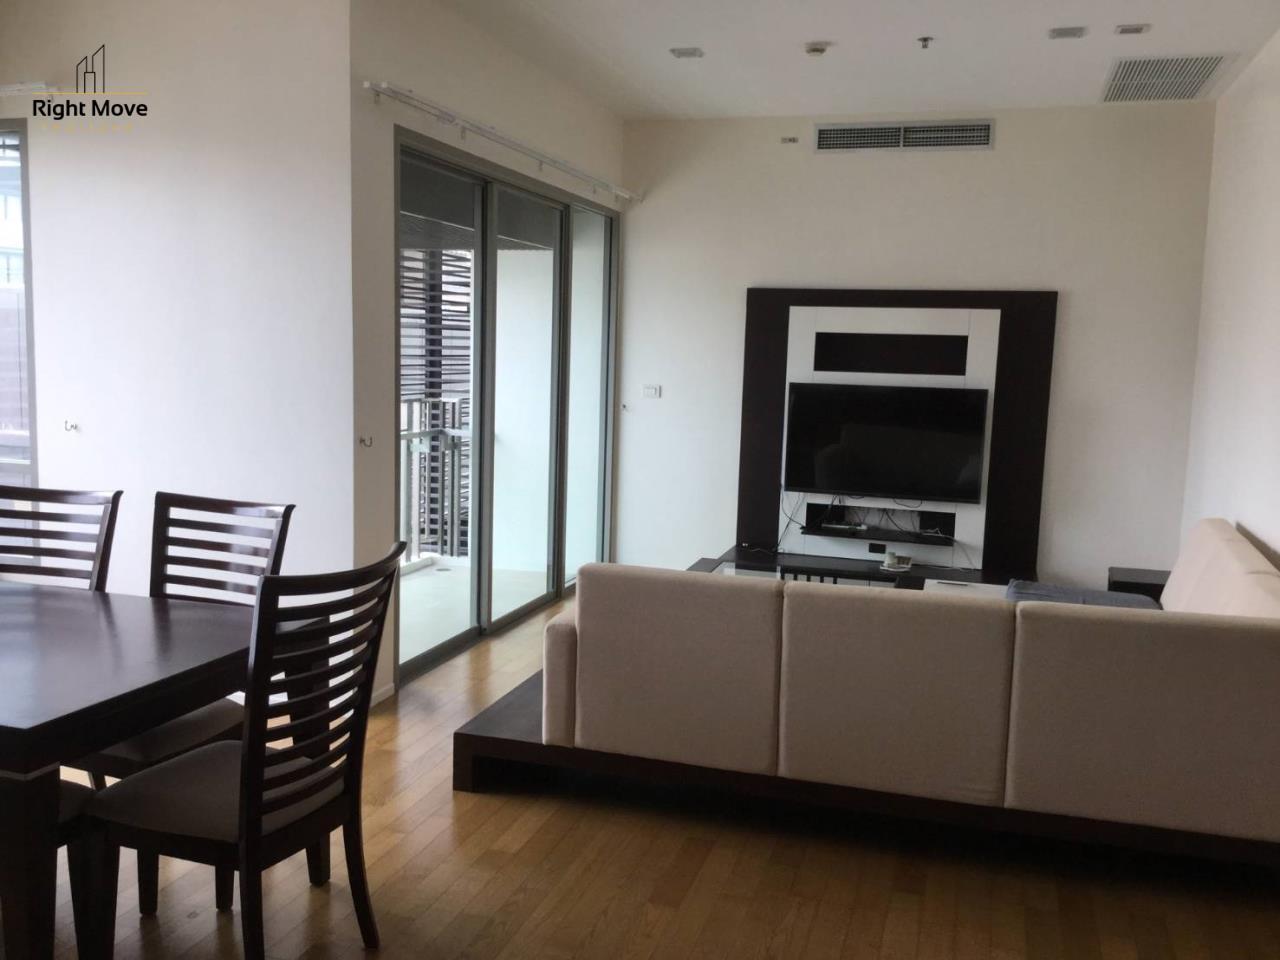 Right Move Thailand Agency's CA5486 Madison Condominium For Rent 90,000 THB - 3 Bedrooms - 160 sqm. 8